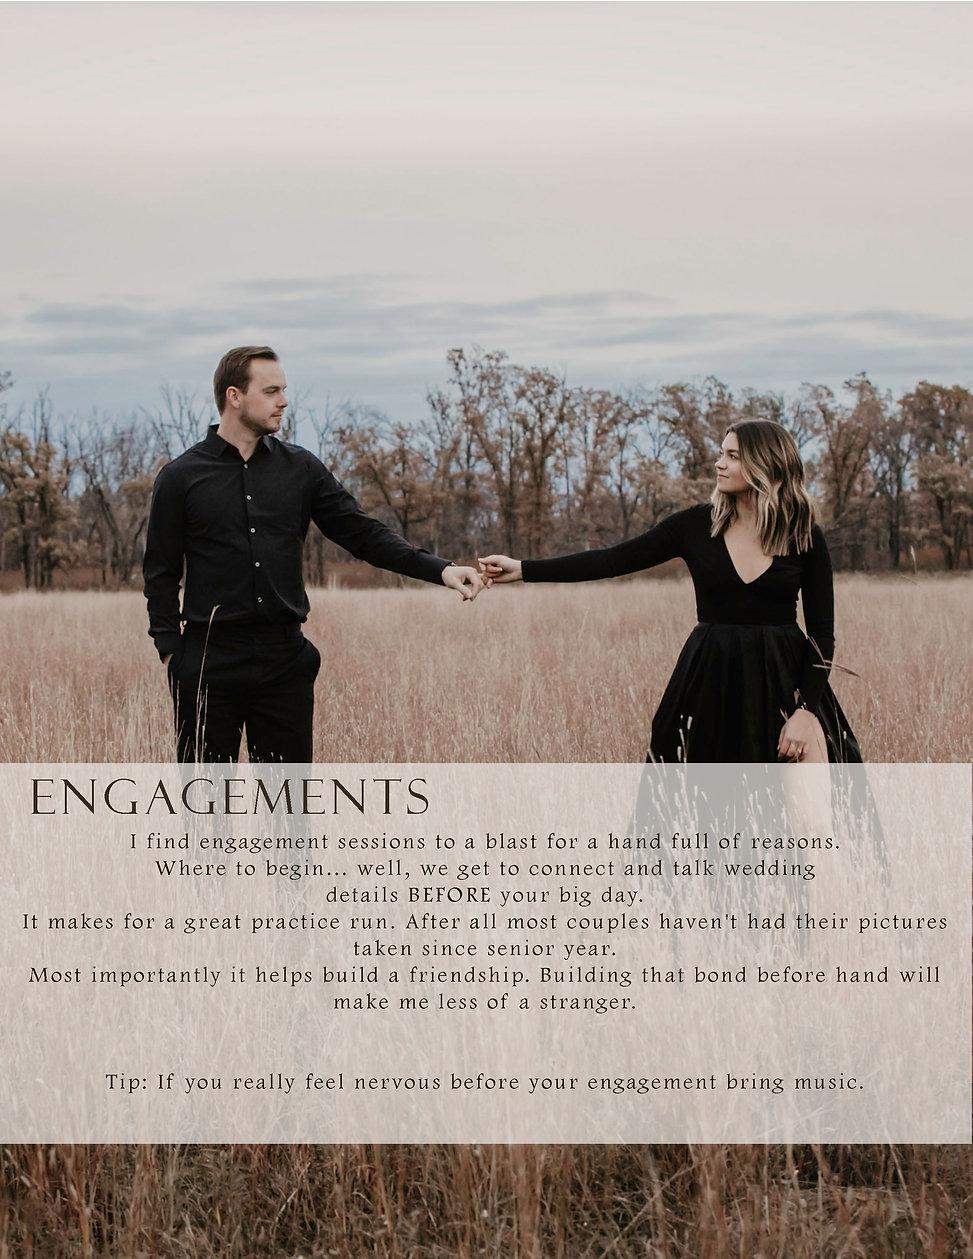 Engagement20204Engagements.jpg